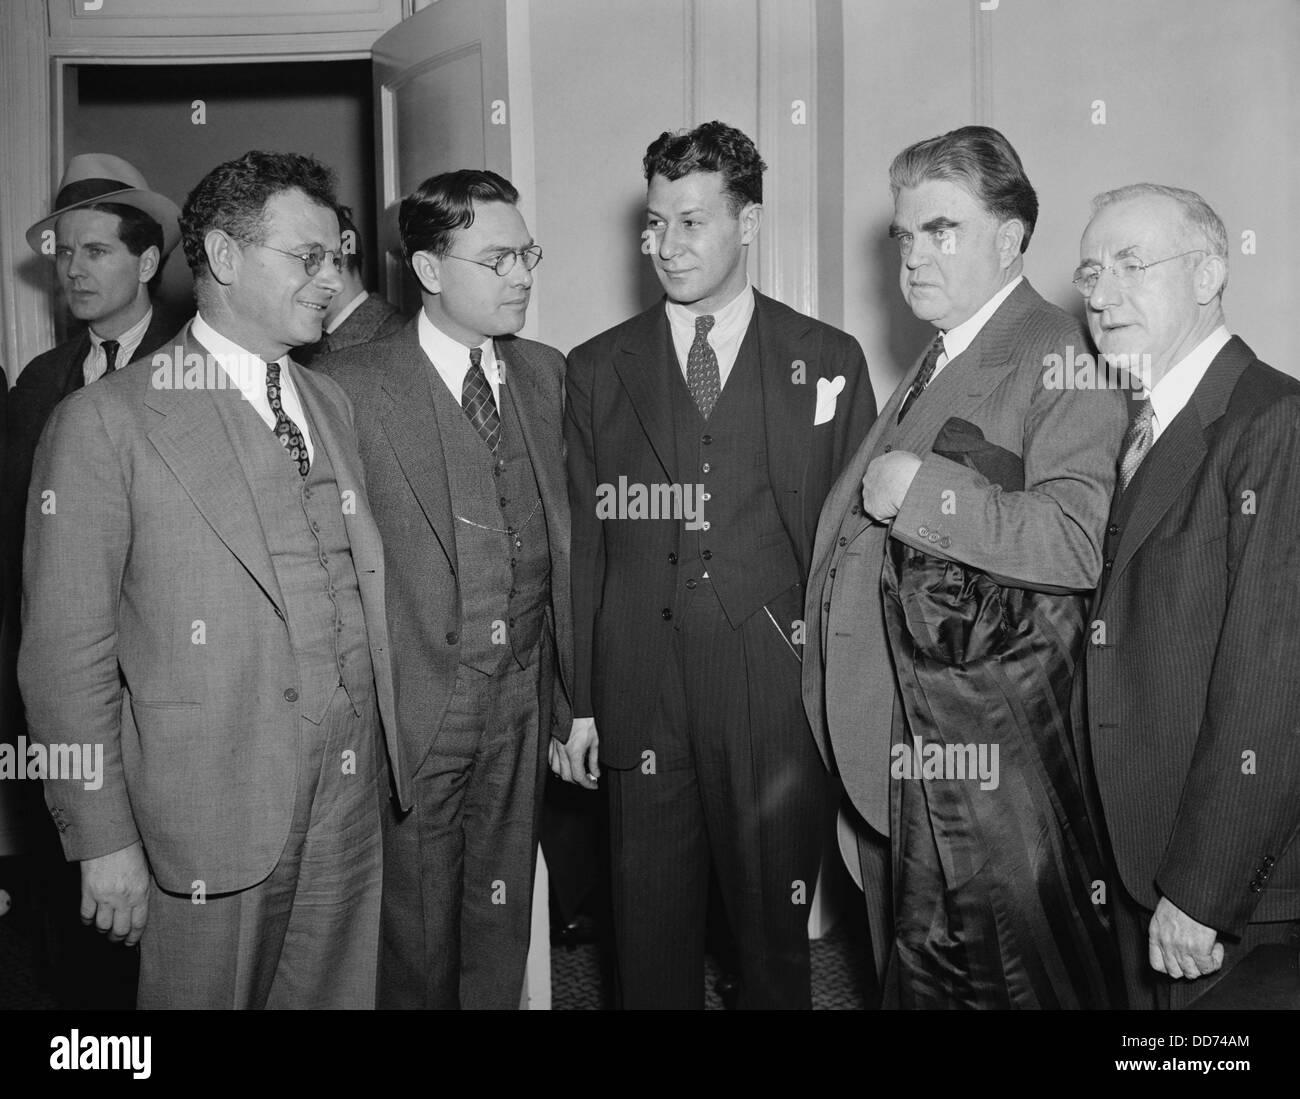 Labor leaders meet to discuss the strike against General Motors. Jan. 12, 1937. L-R: Sidney Hillman, CIO; Homer - Stock Image